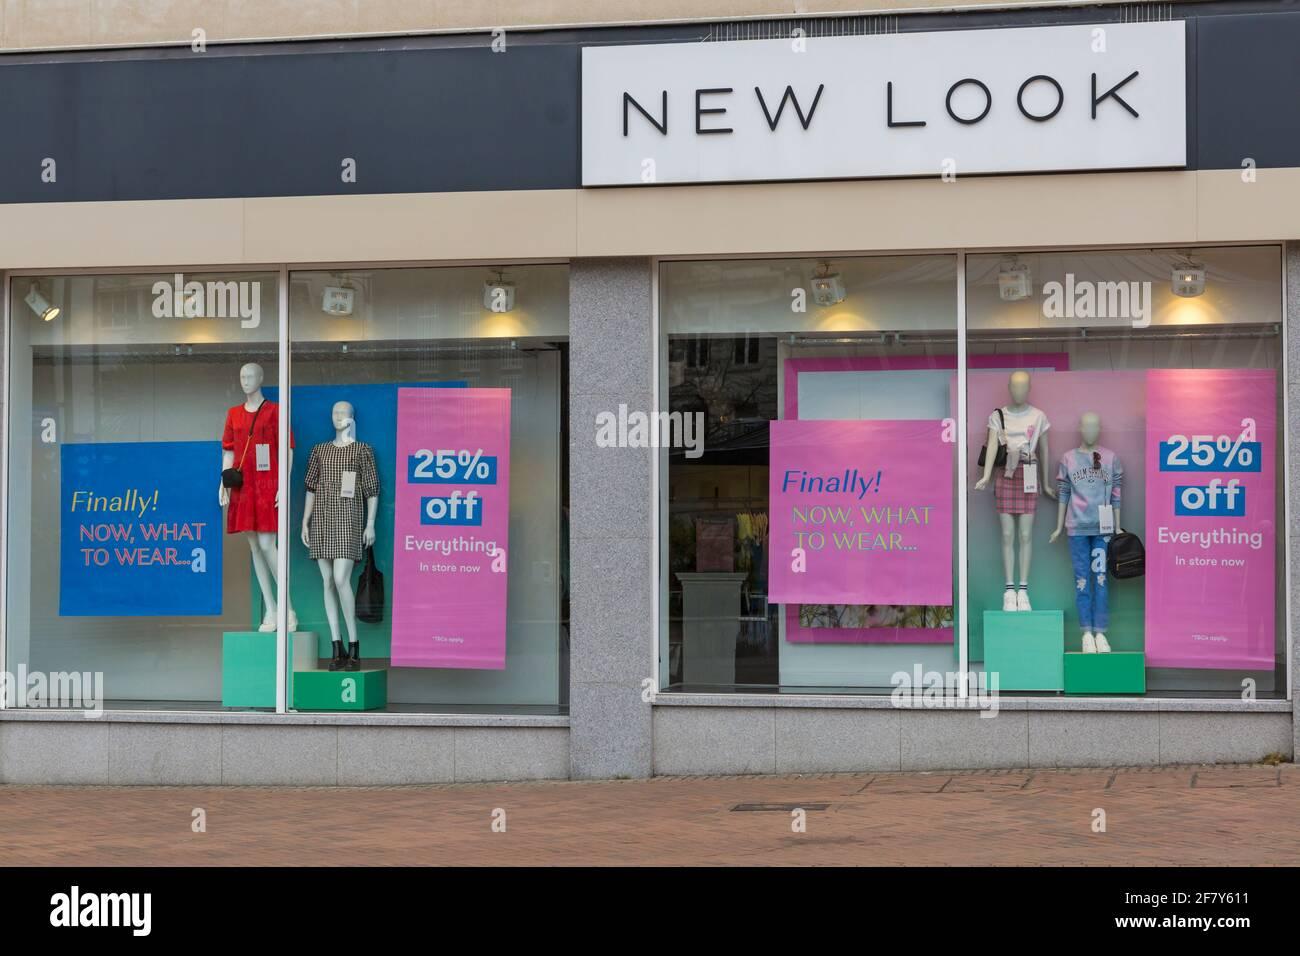 20  Rabatt auf alles im New Look Store in Bournemouth, Dorset ...